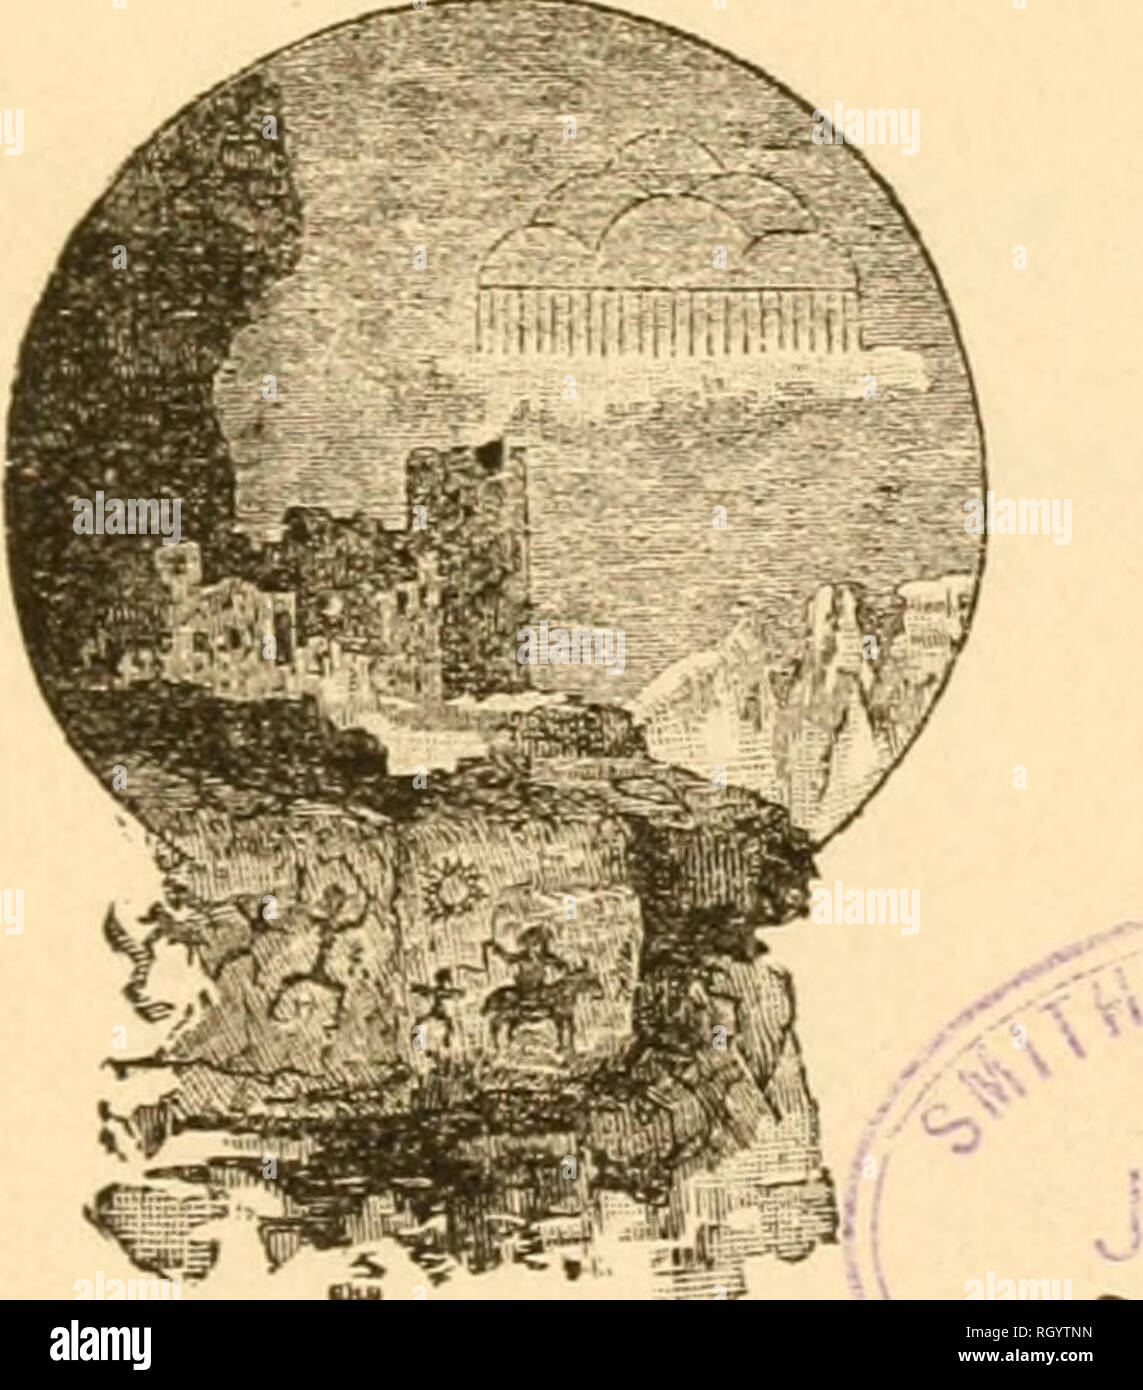 76849c1c1bb7 SMITHSONIAN INSTITUTION BUREAU OF AMERICAN ETHNOLOGY BULLETIN 92 V  V lt 2»  V